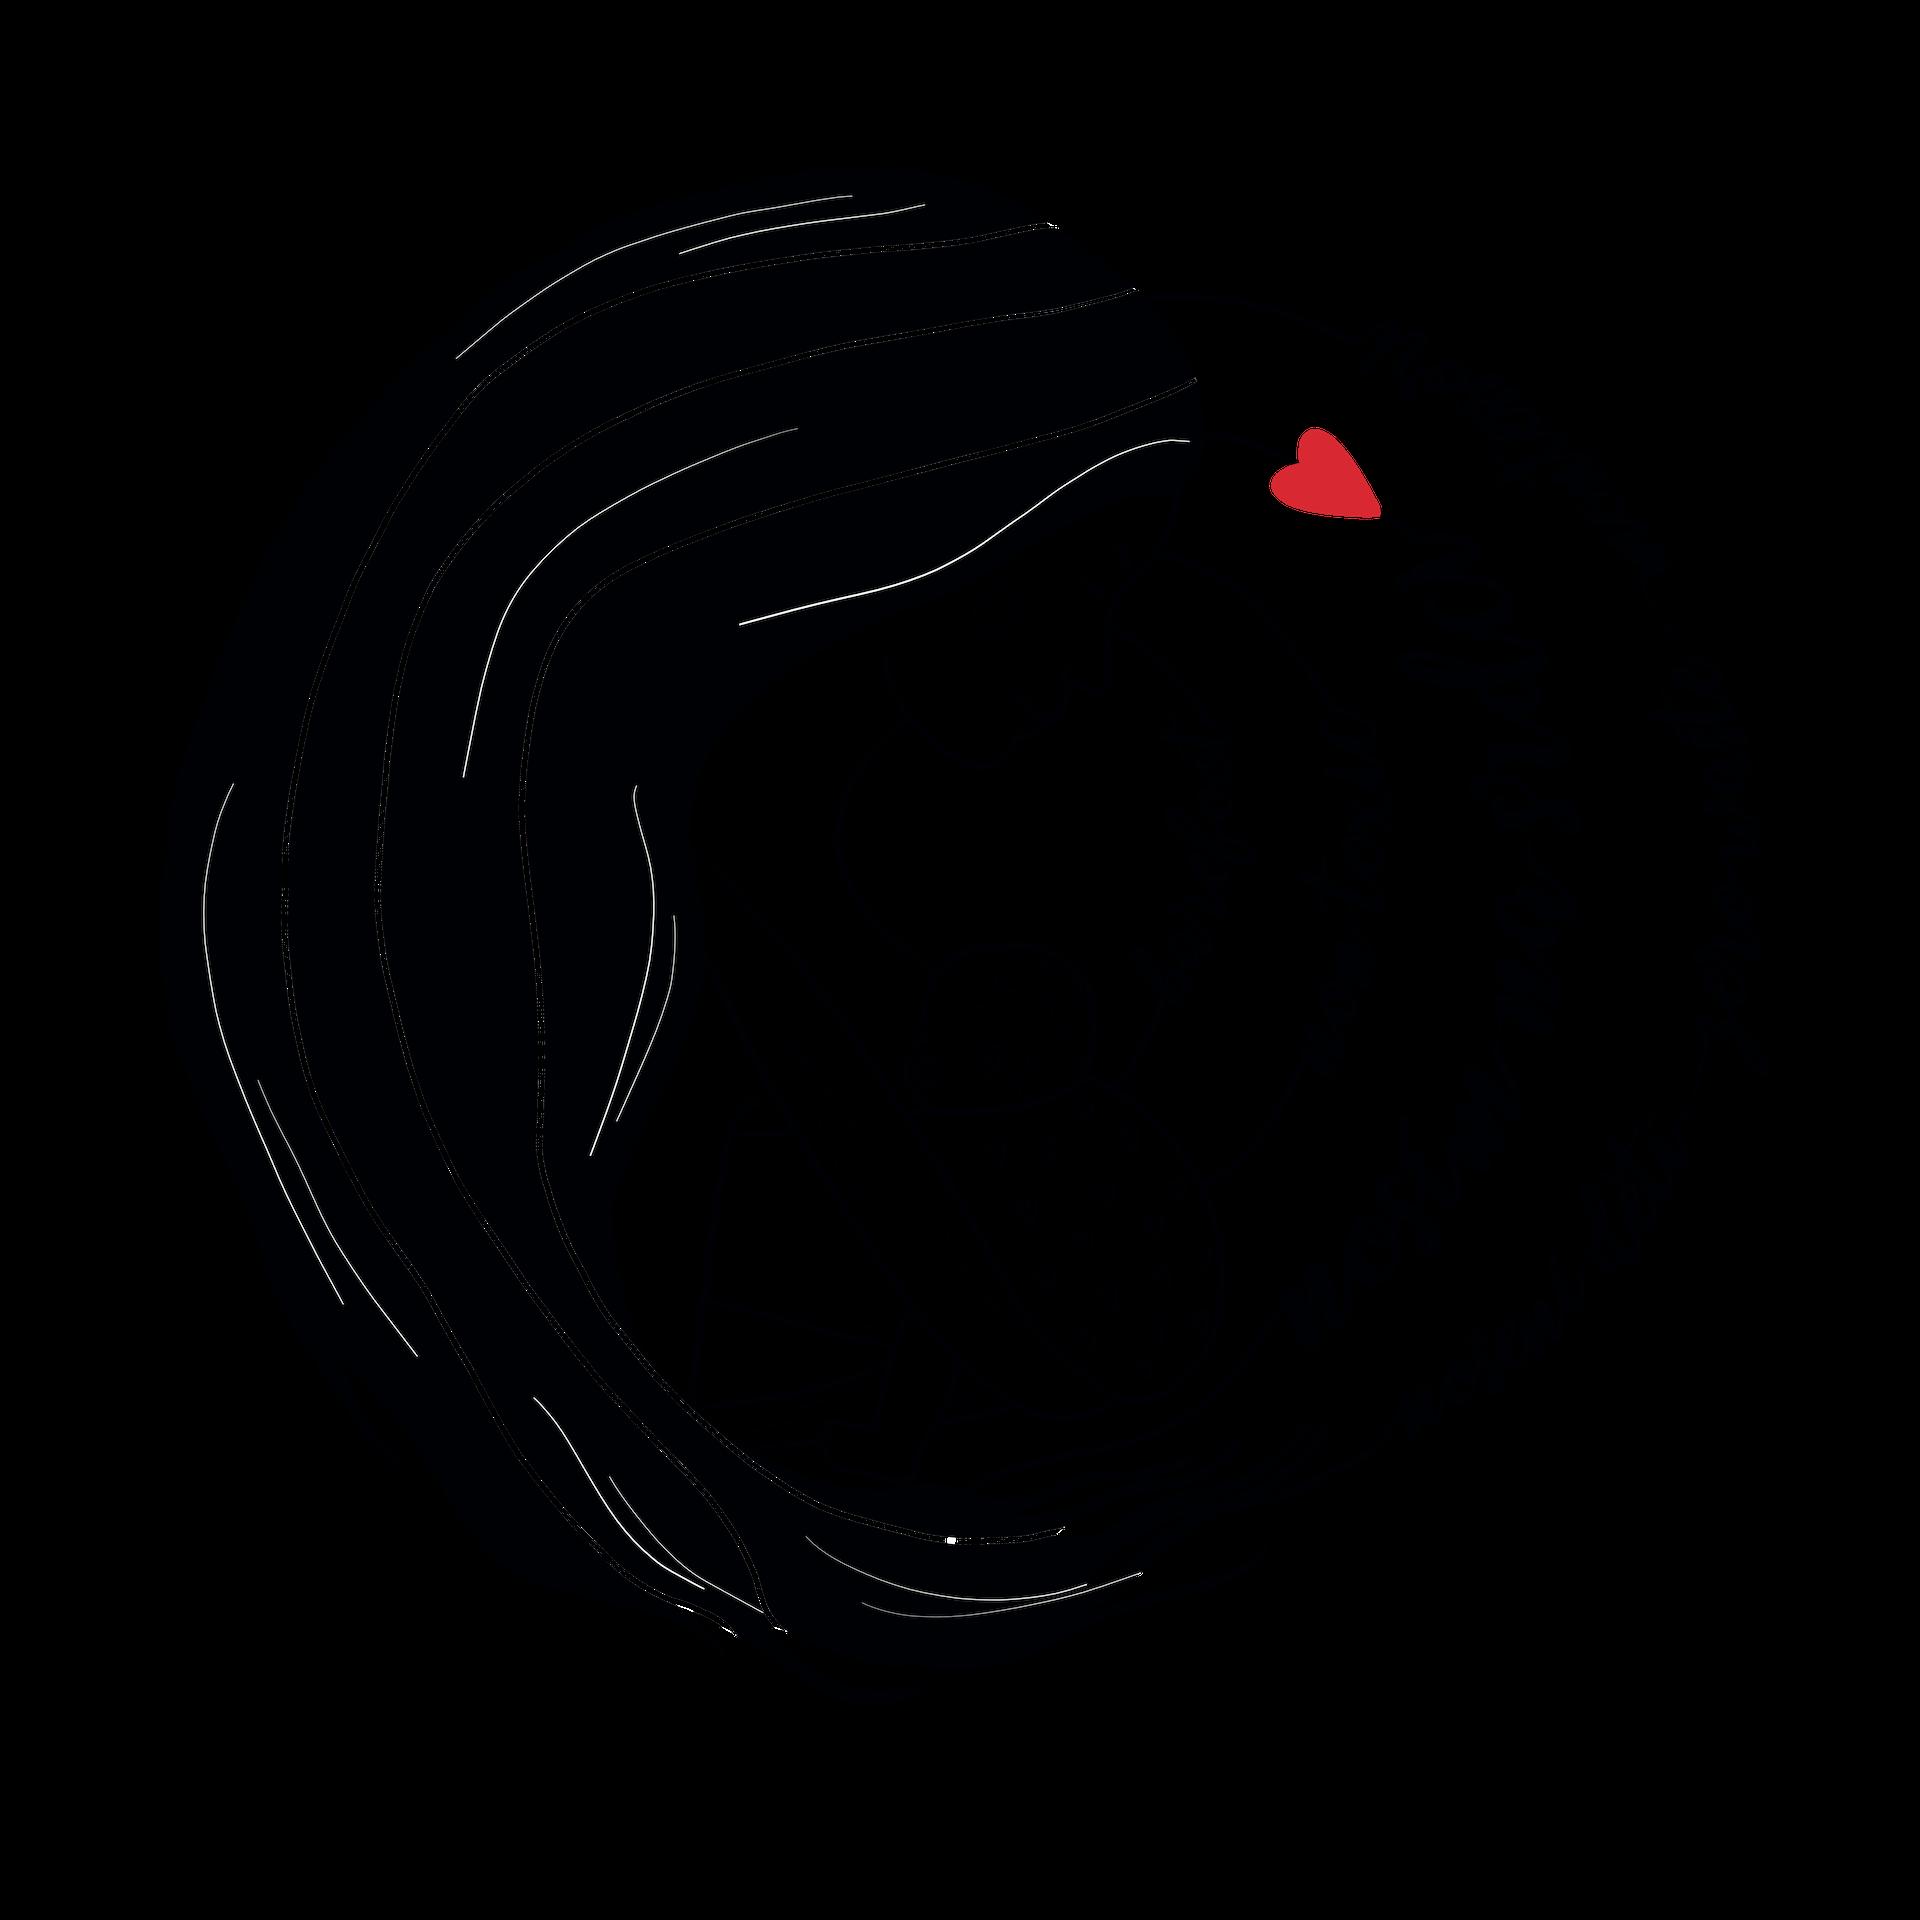 logo_skupinanosimnasrdci_trsansparent